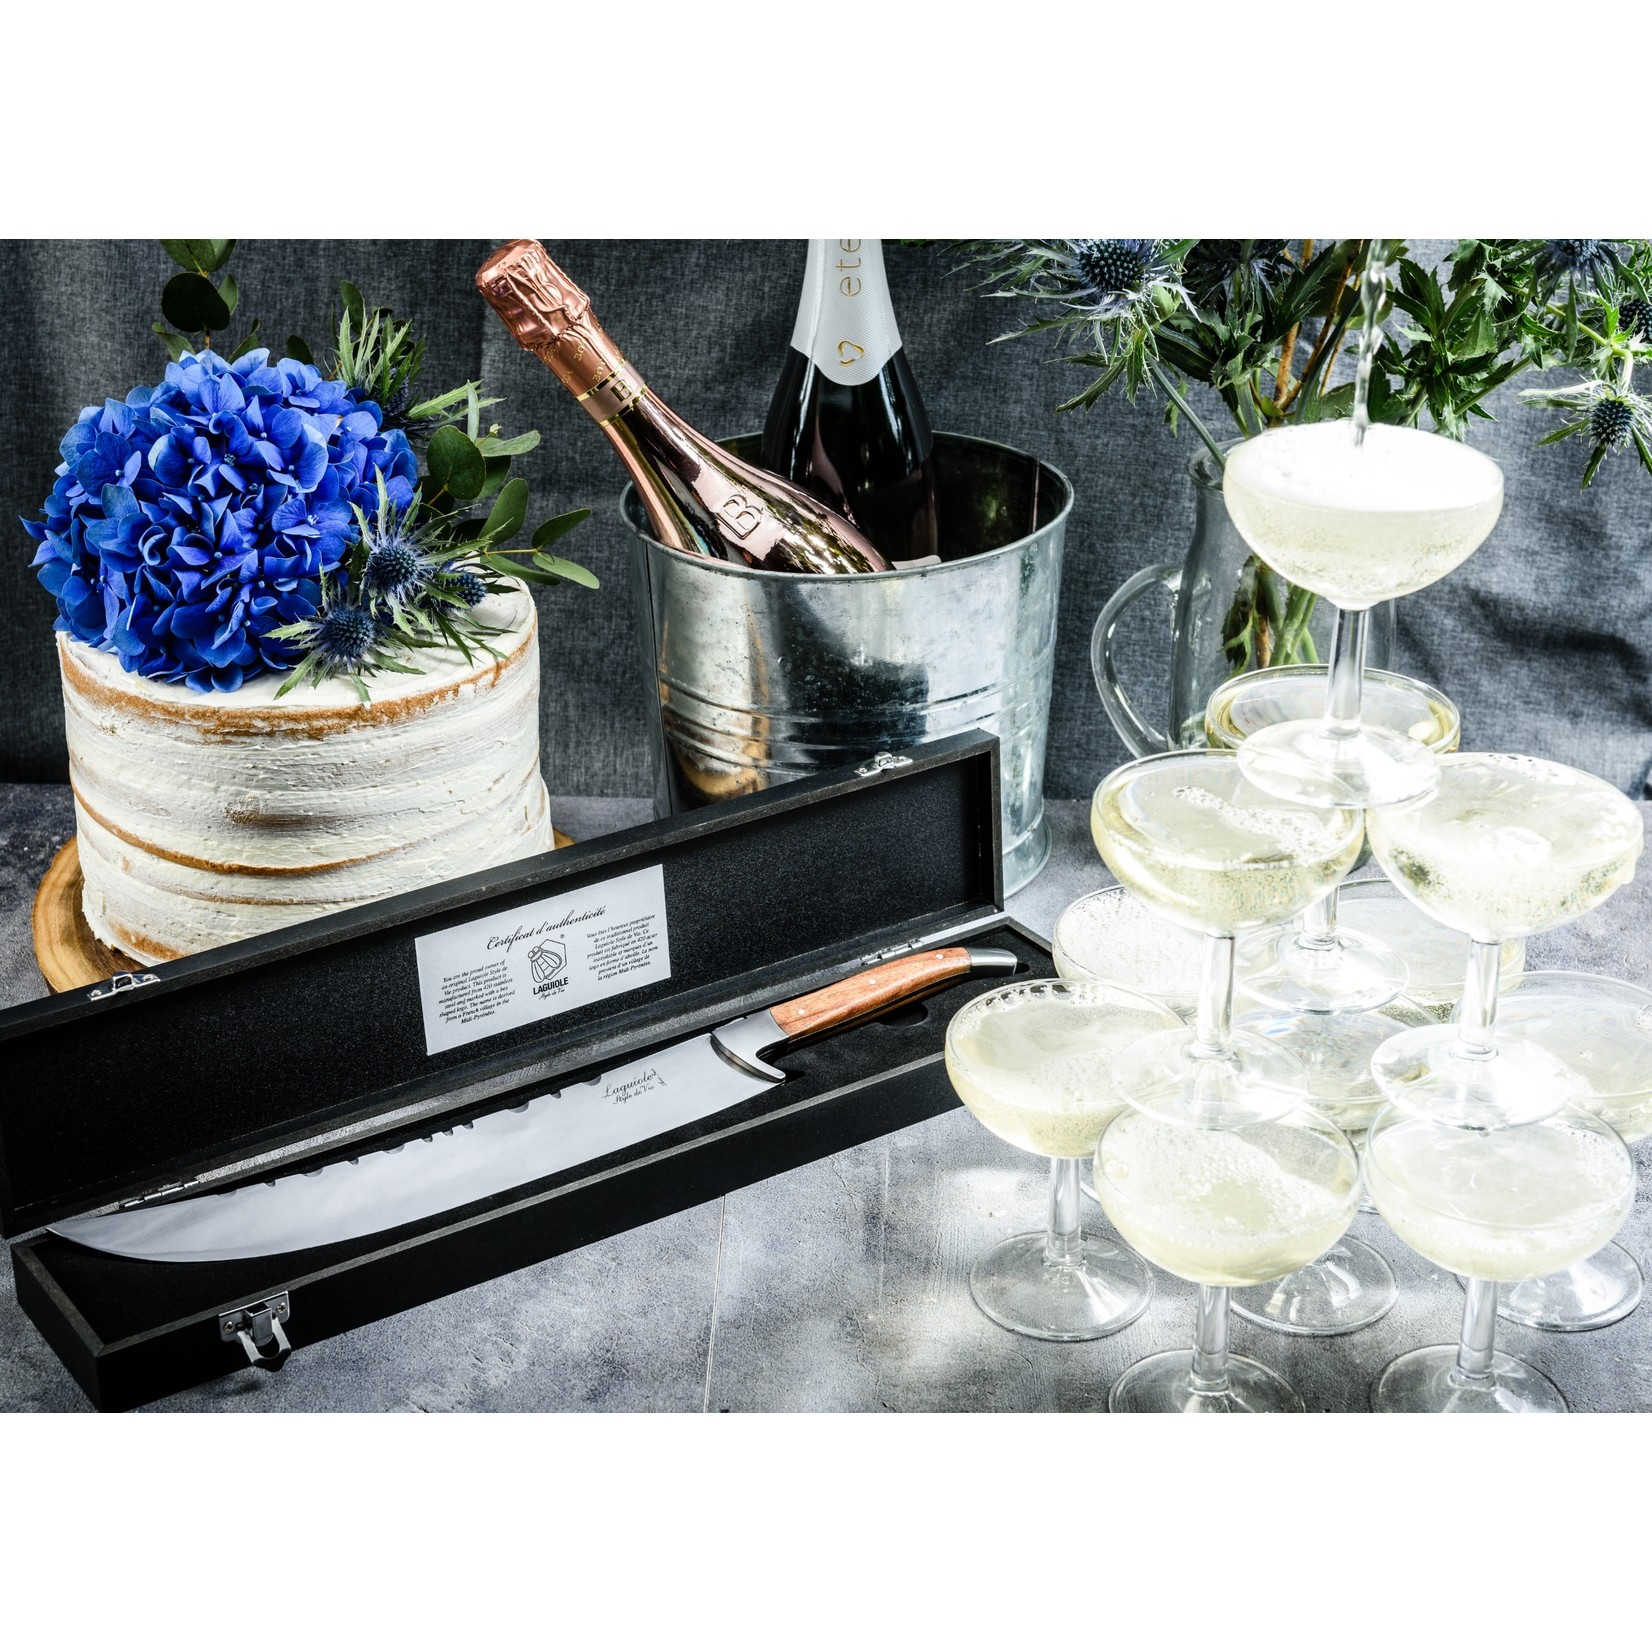 Laguiole Style de Vie Laguiole Style de Vie Luxury Line champagnezwaard rozenhout